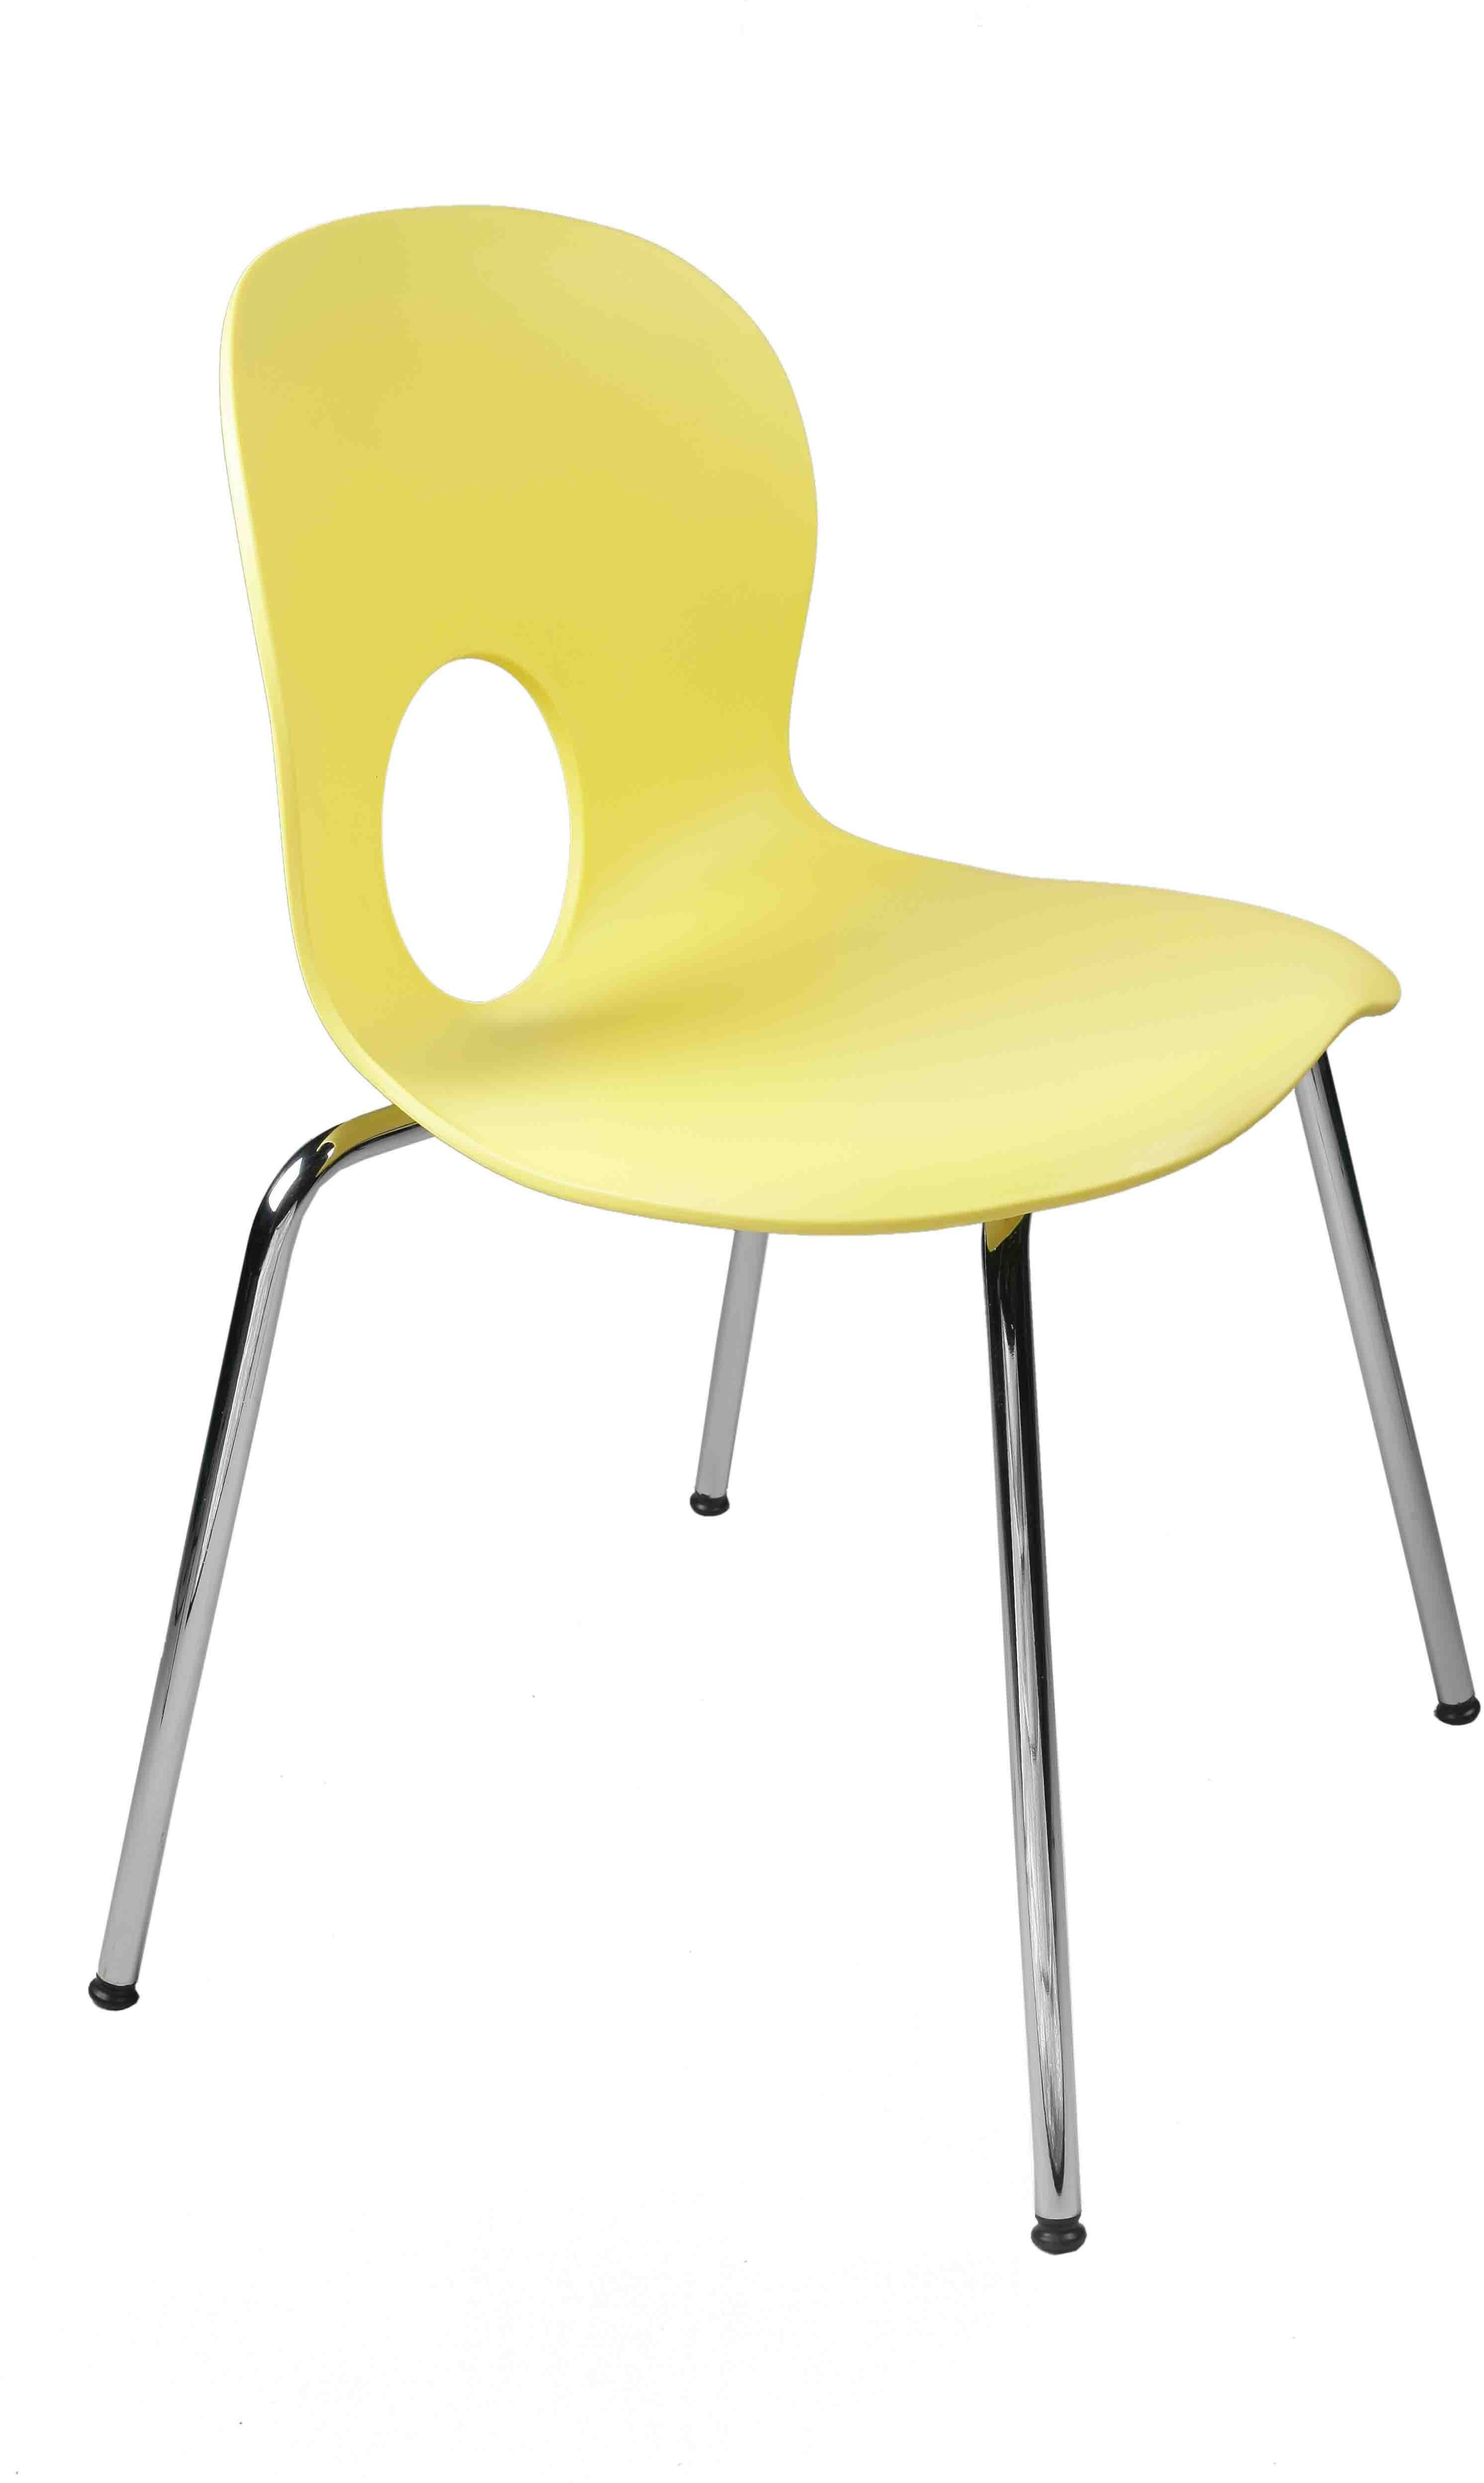 View Ventura Plastic Cafeteria Chair(Finish Color - Yellow) Furniture (Ventura)